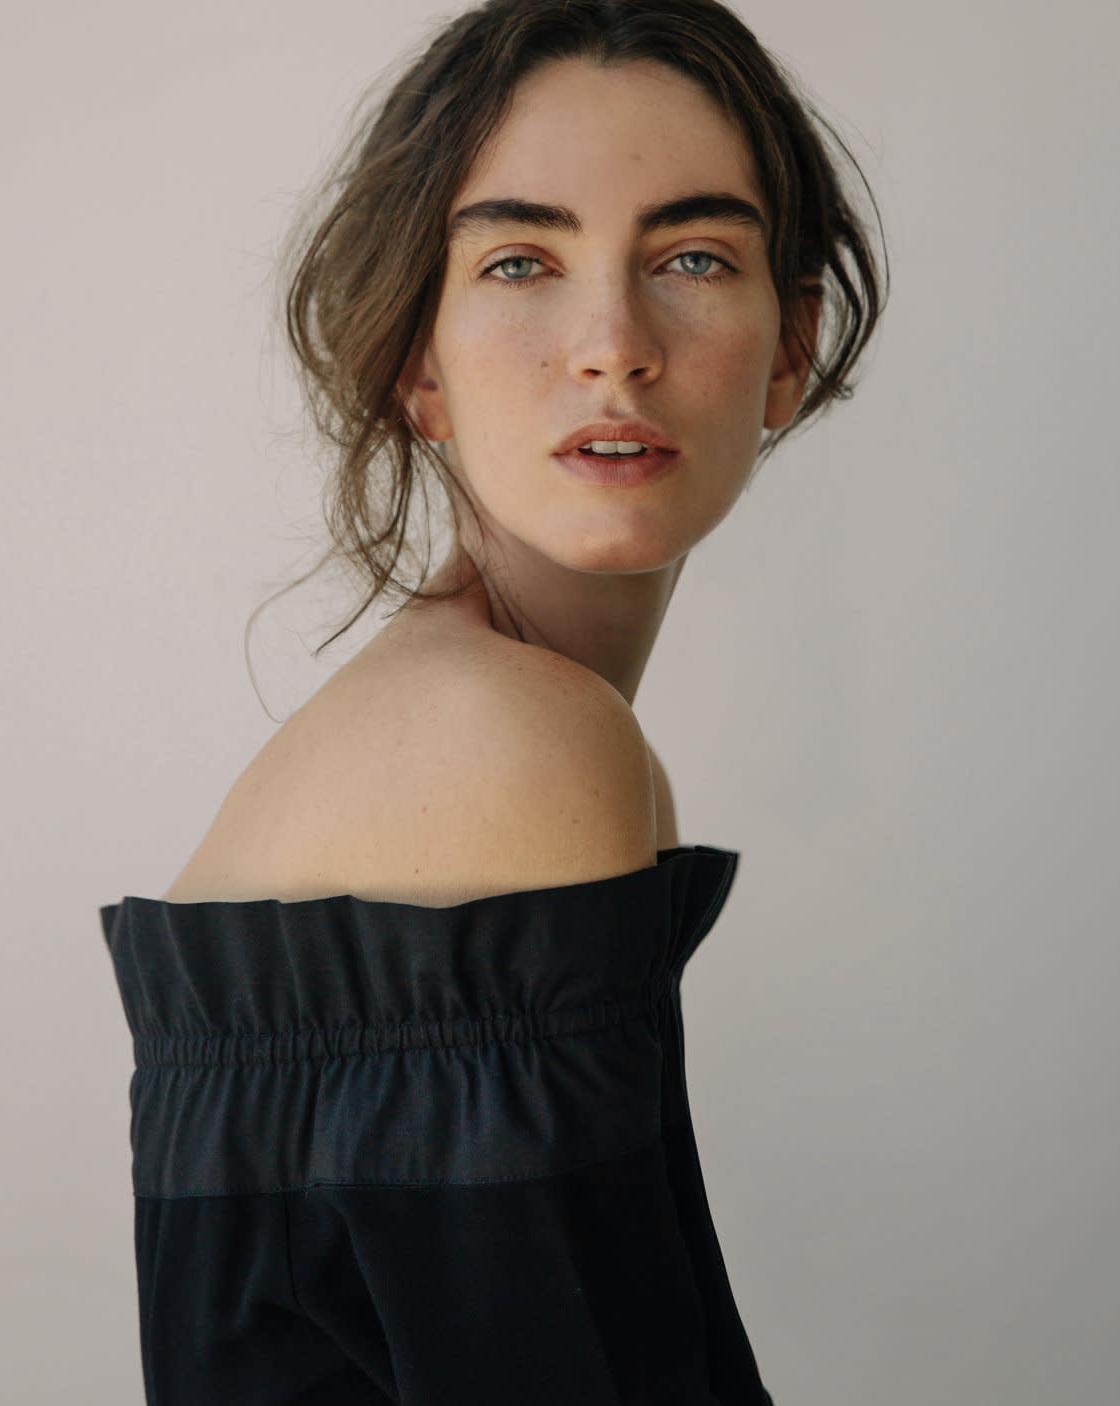 Ana Grebler 30